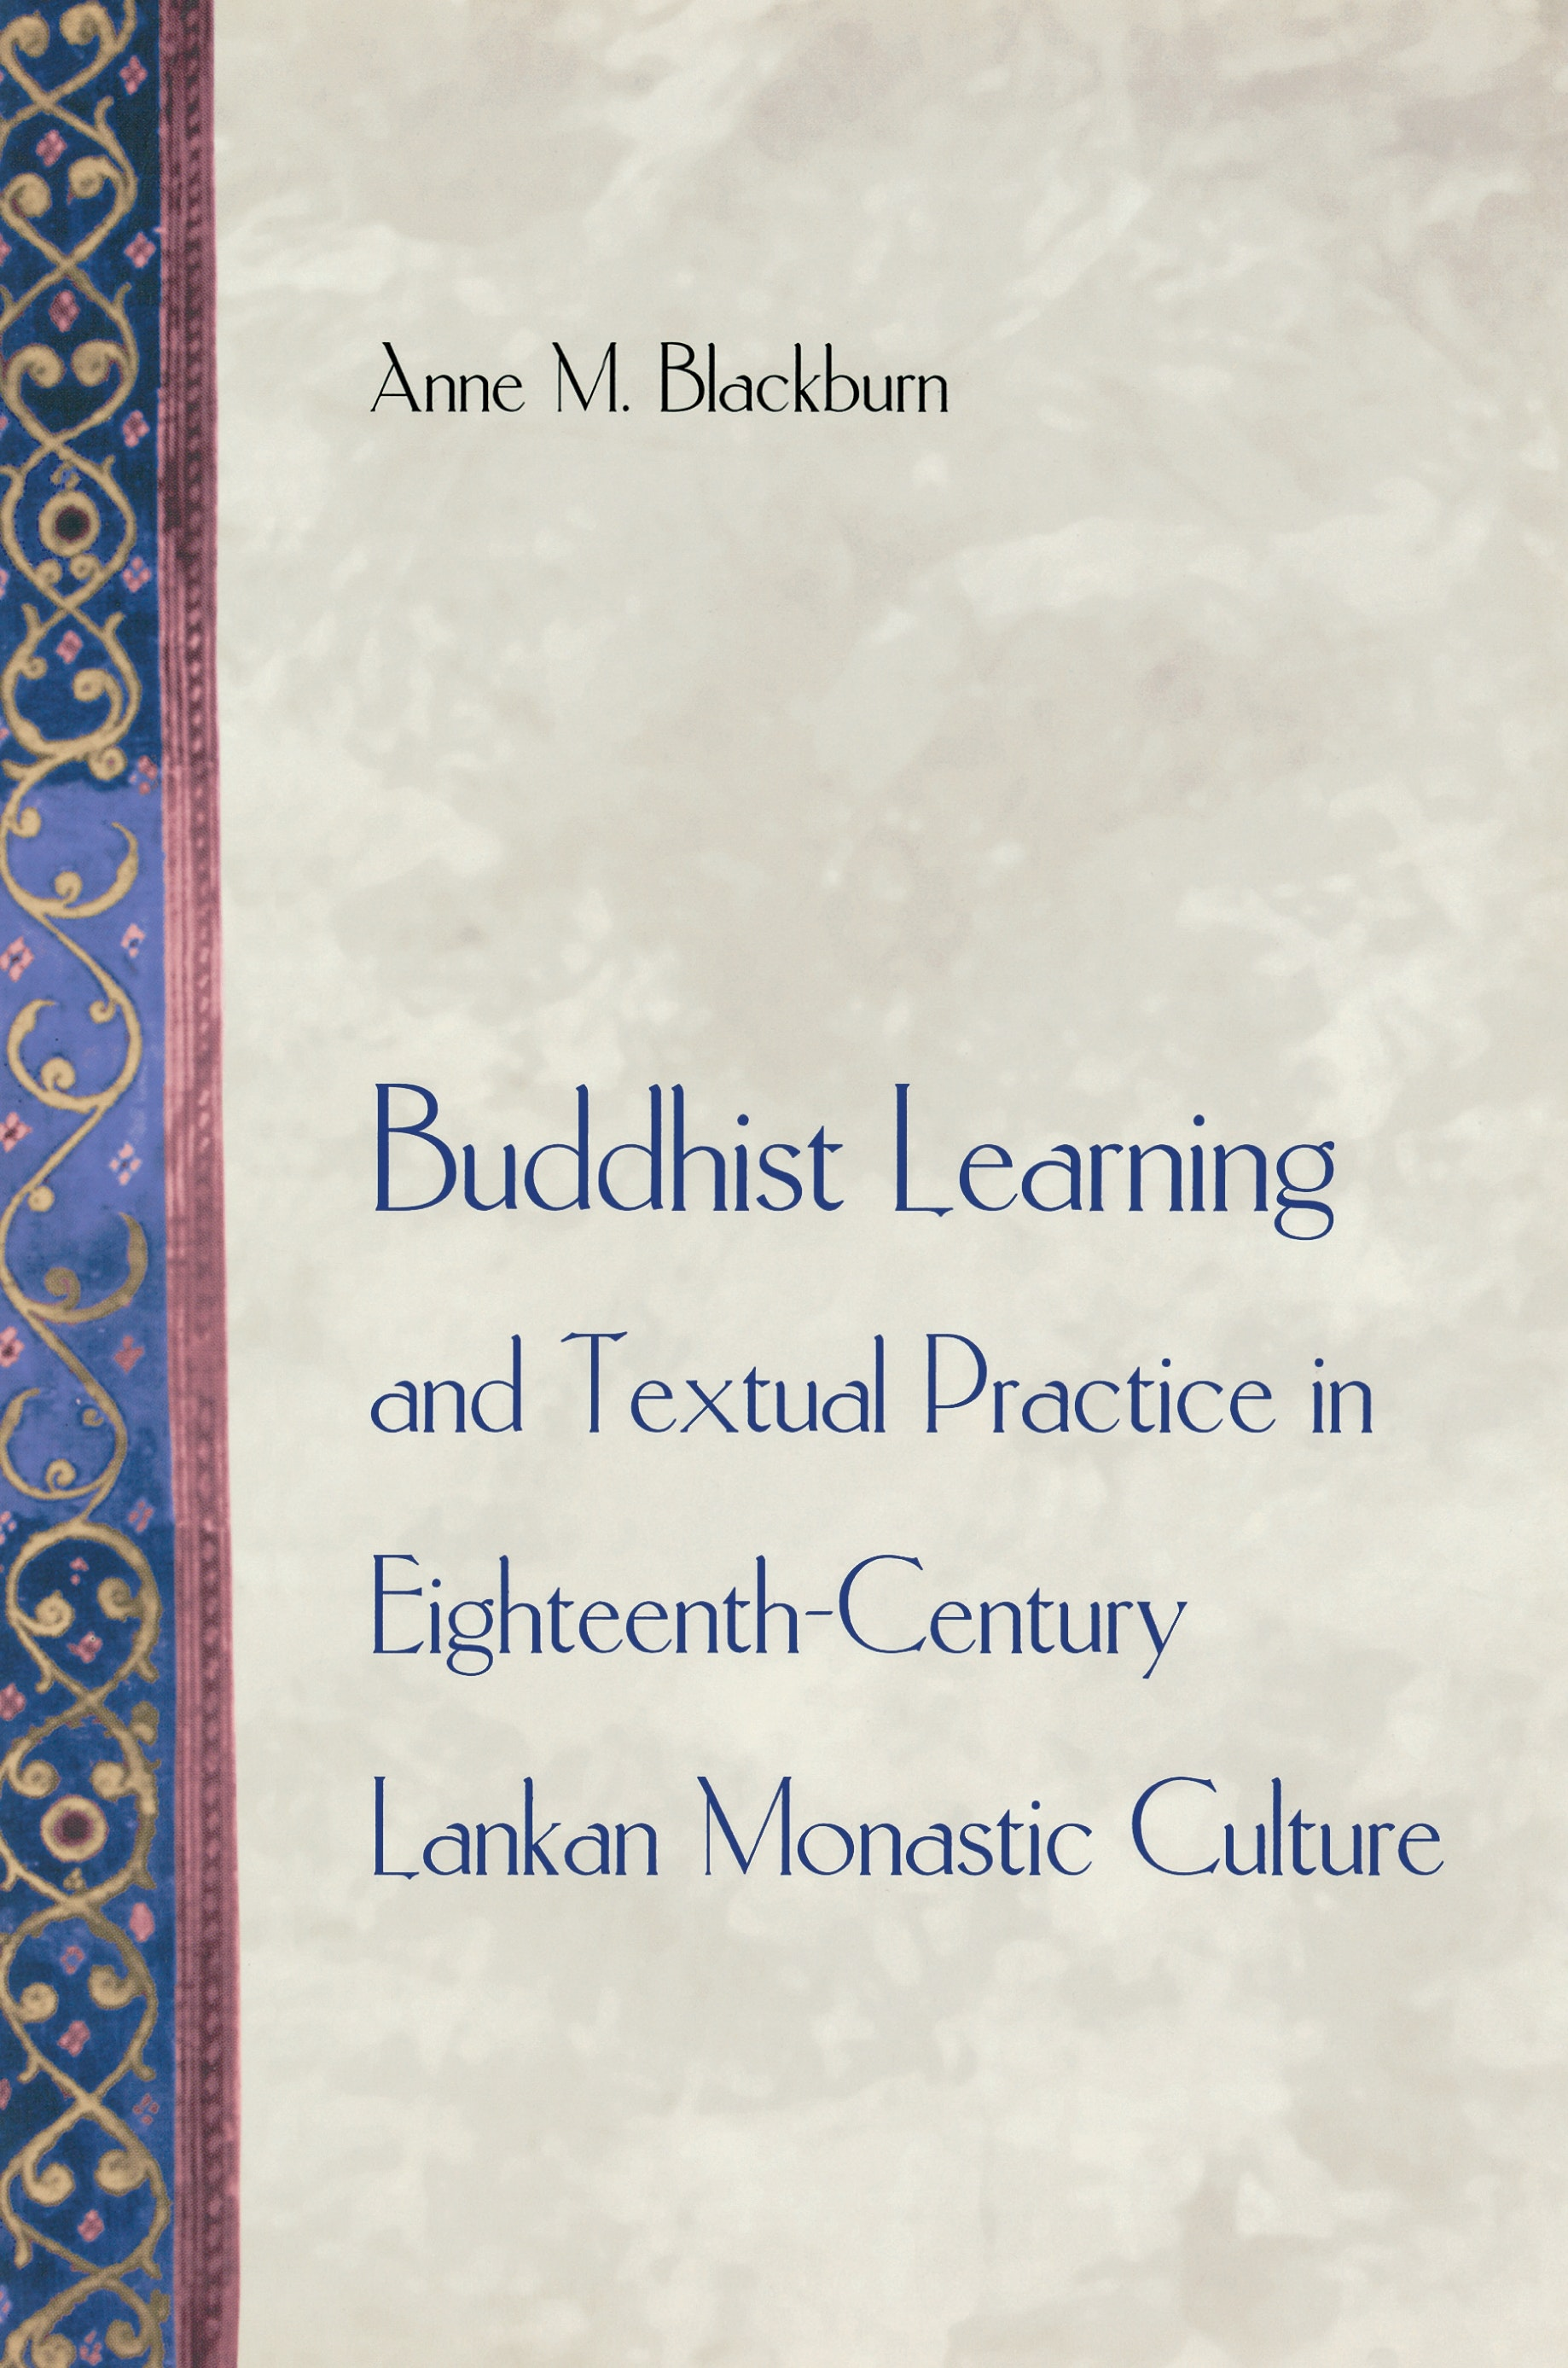 Textual Practice: Volume 6, Issue 2 (Textual Practice Journal)